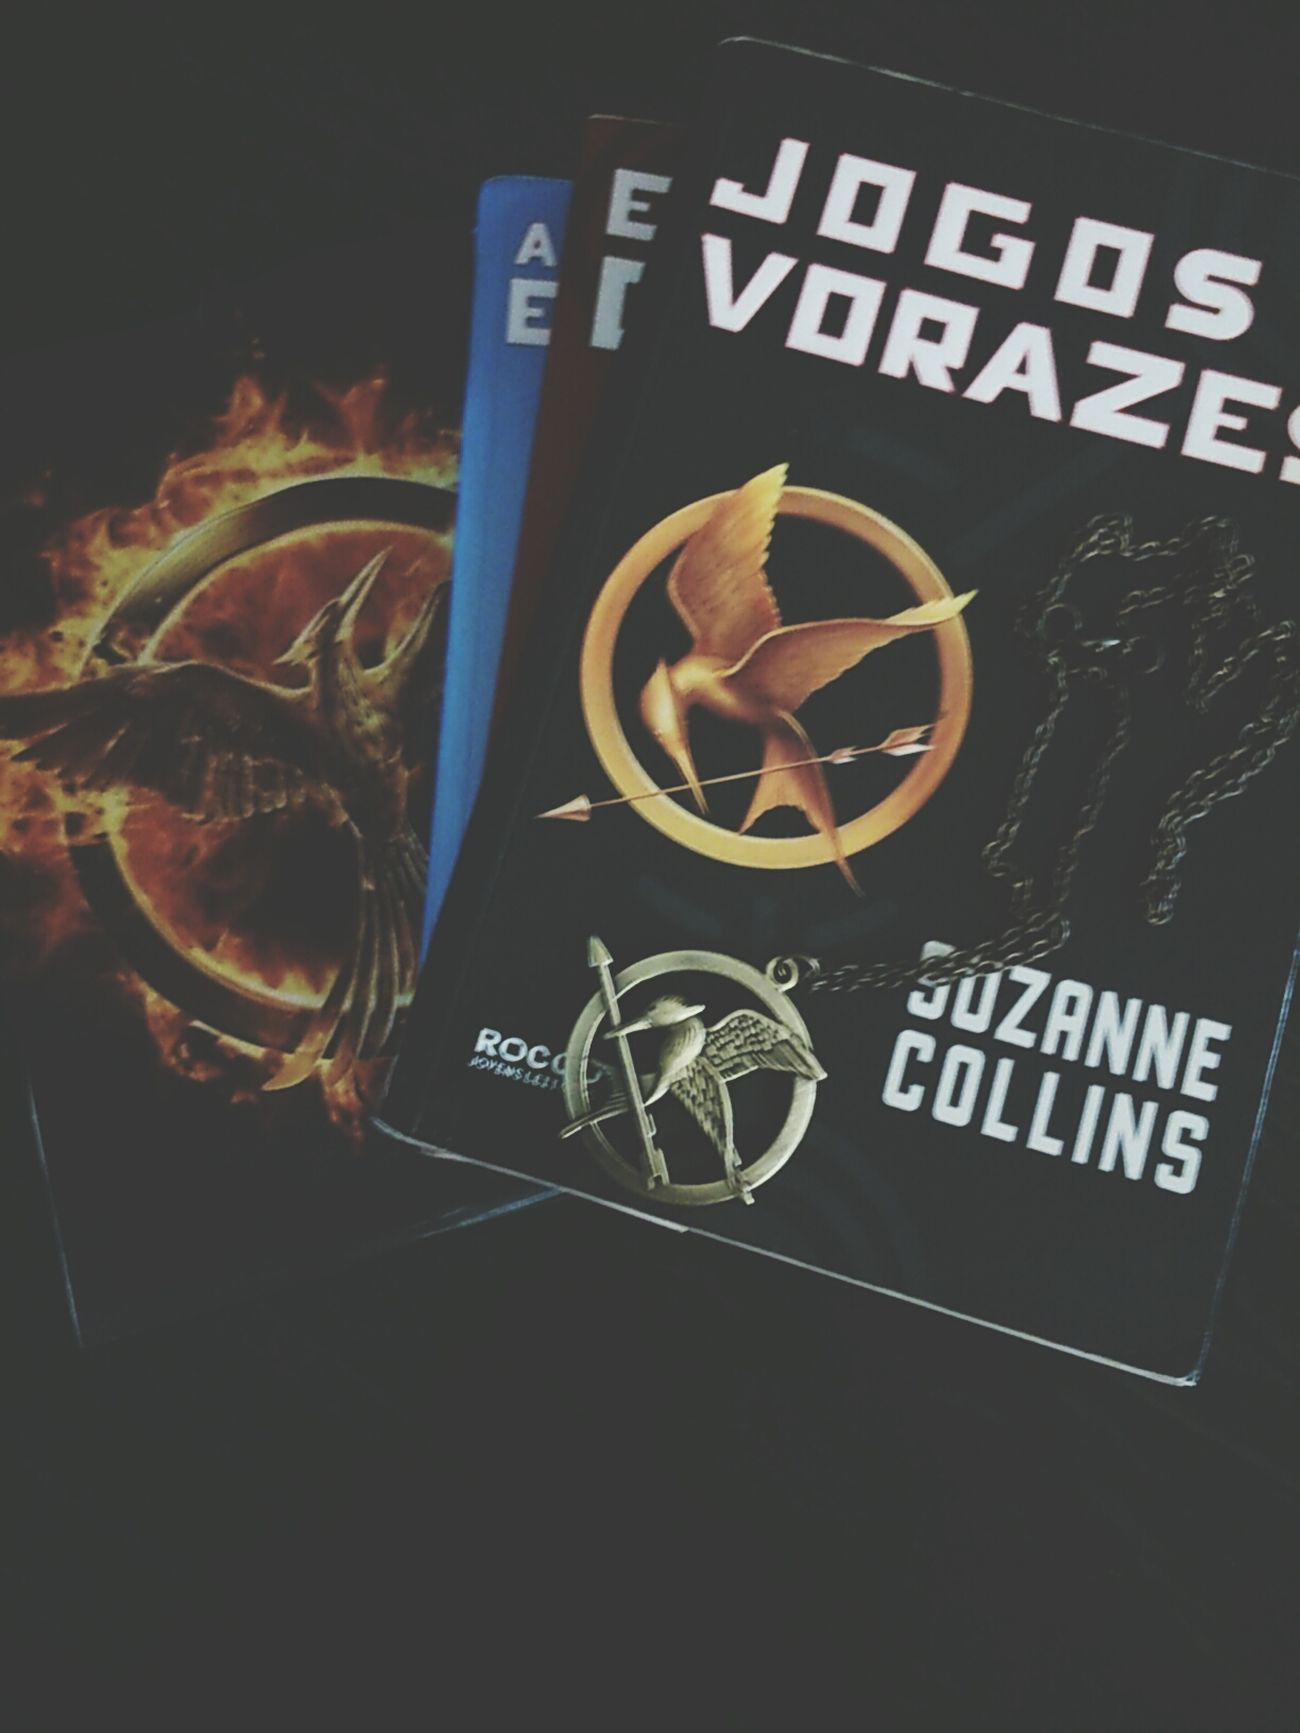 JogosVorazes Thehungergames Books